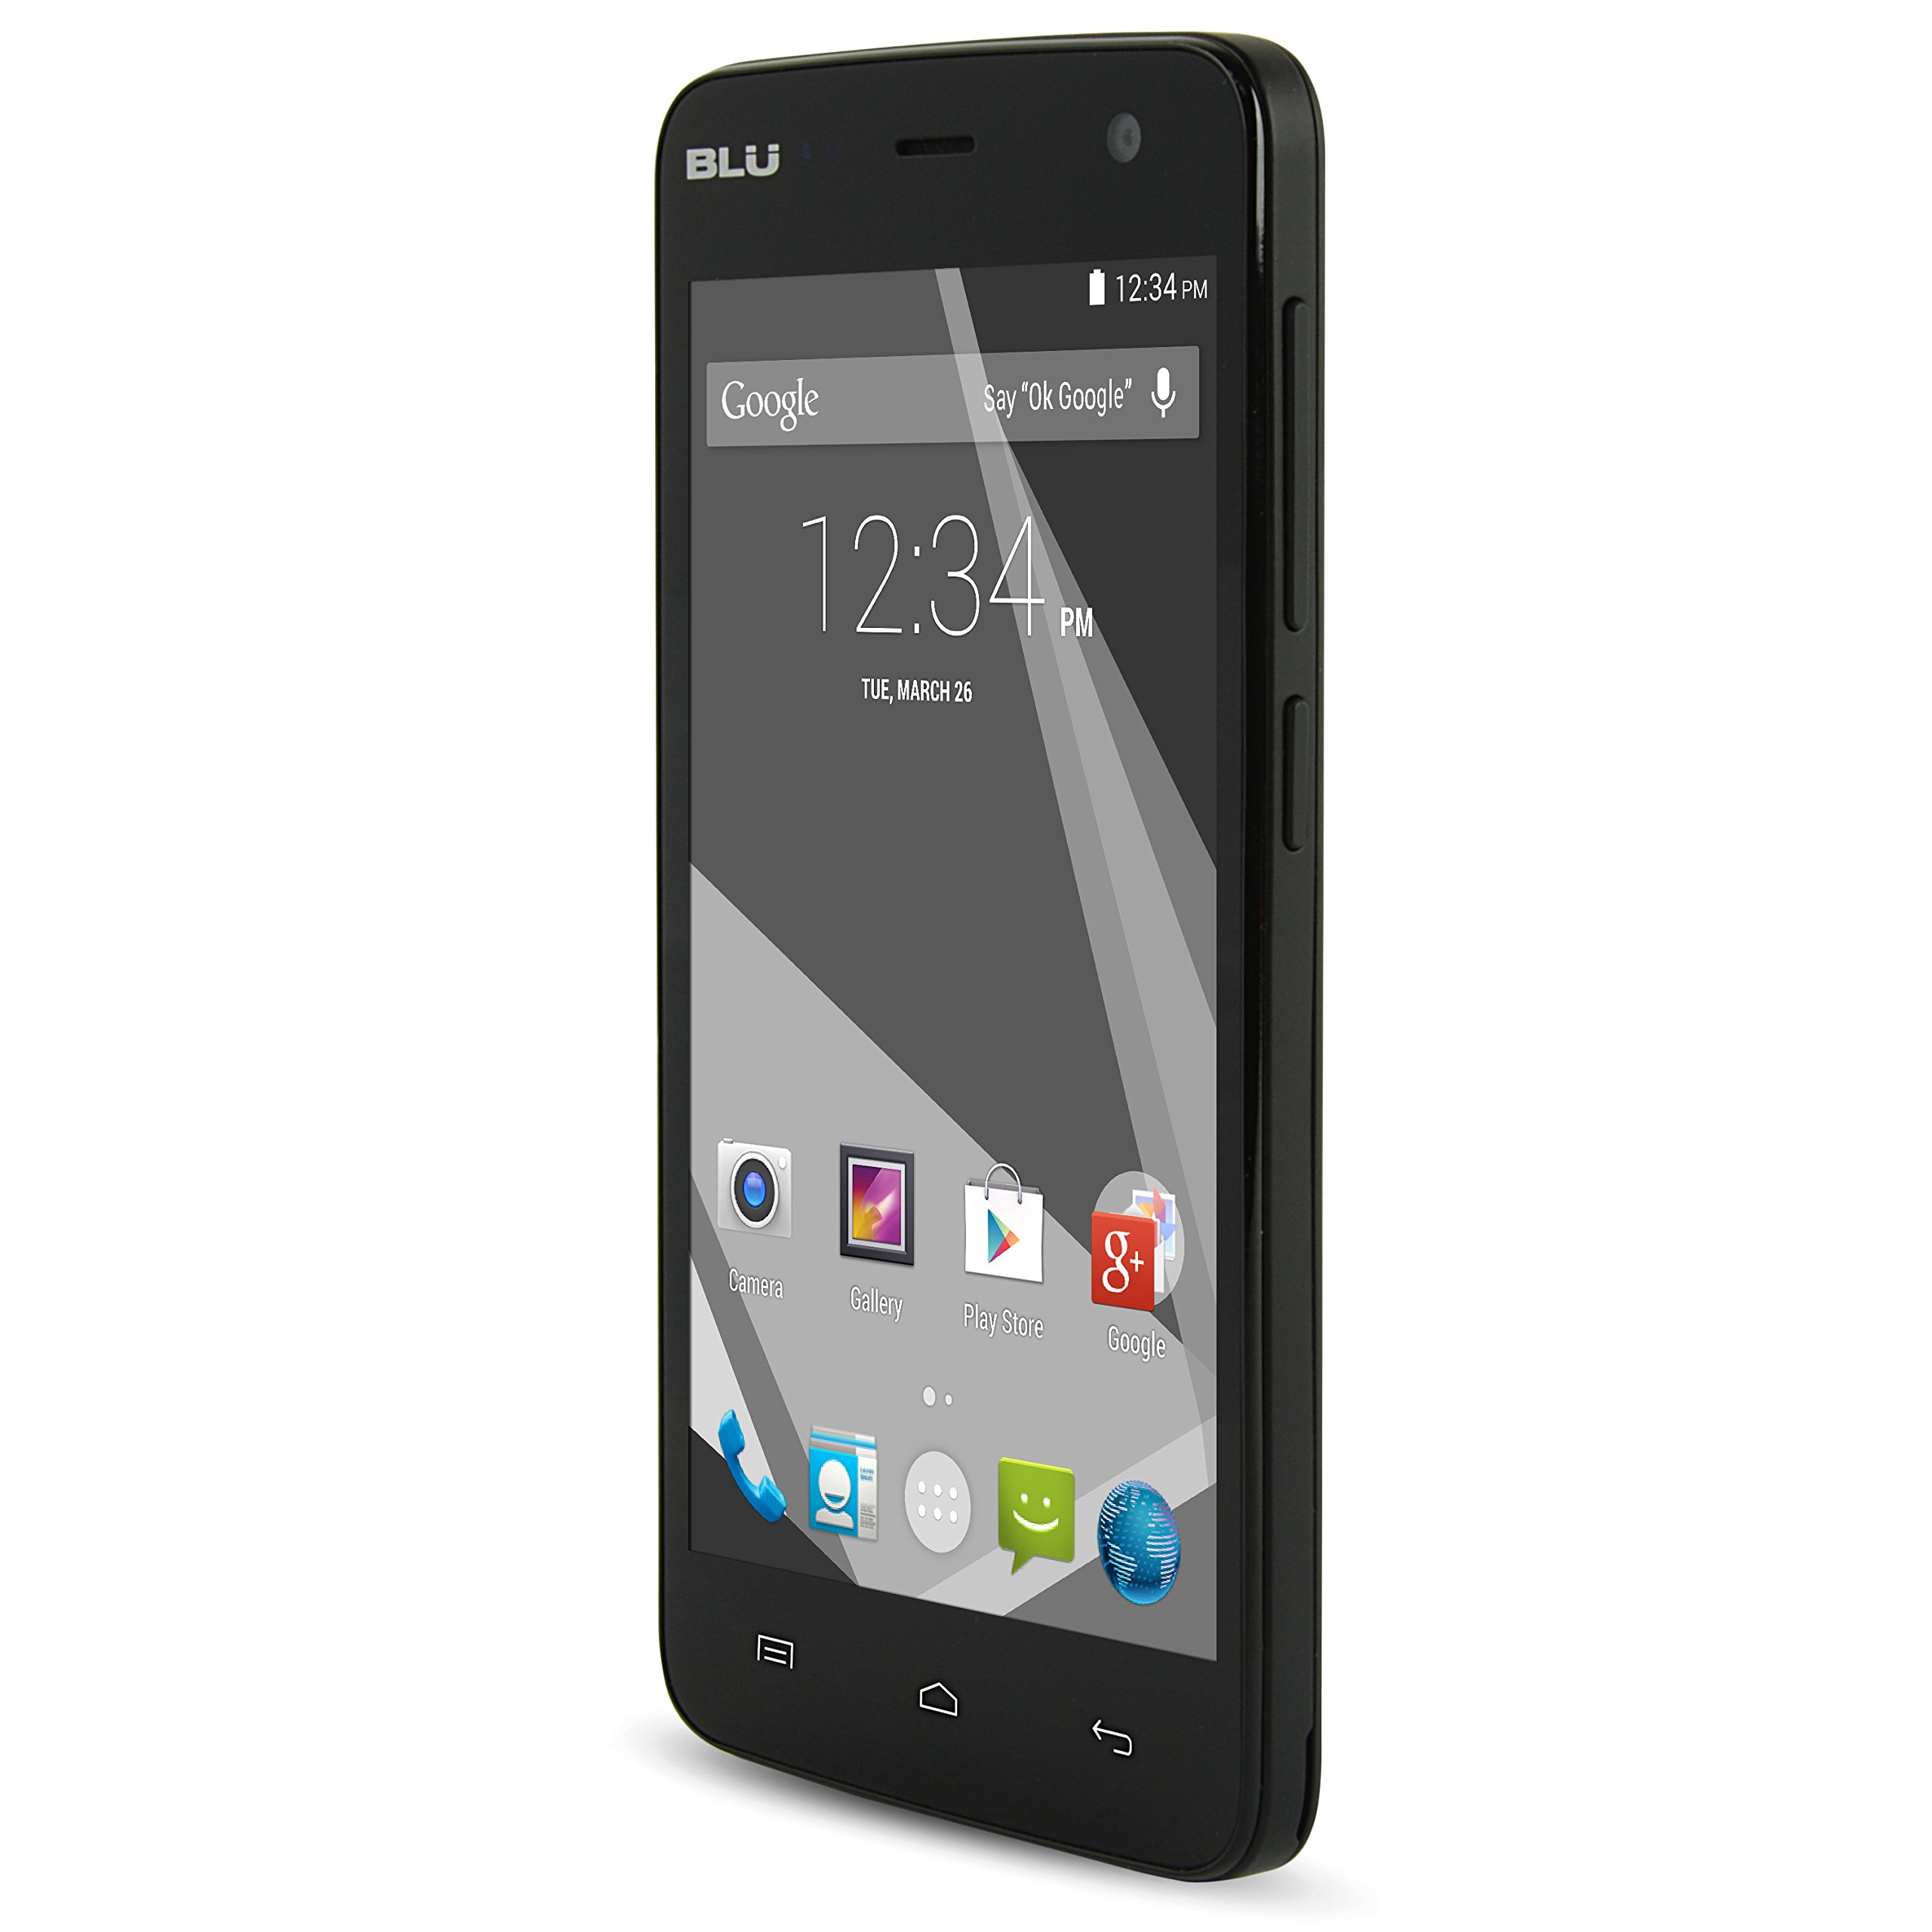 "Blu Studio C Mini Quad Core, 4.7"" IPS, Android 4.4 KK, 4G HSPA+, 5MP Camera - Unlocked Cell Phones -Black"